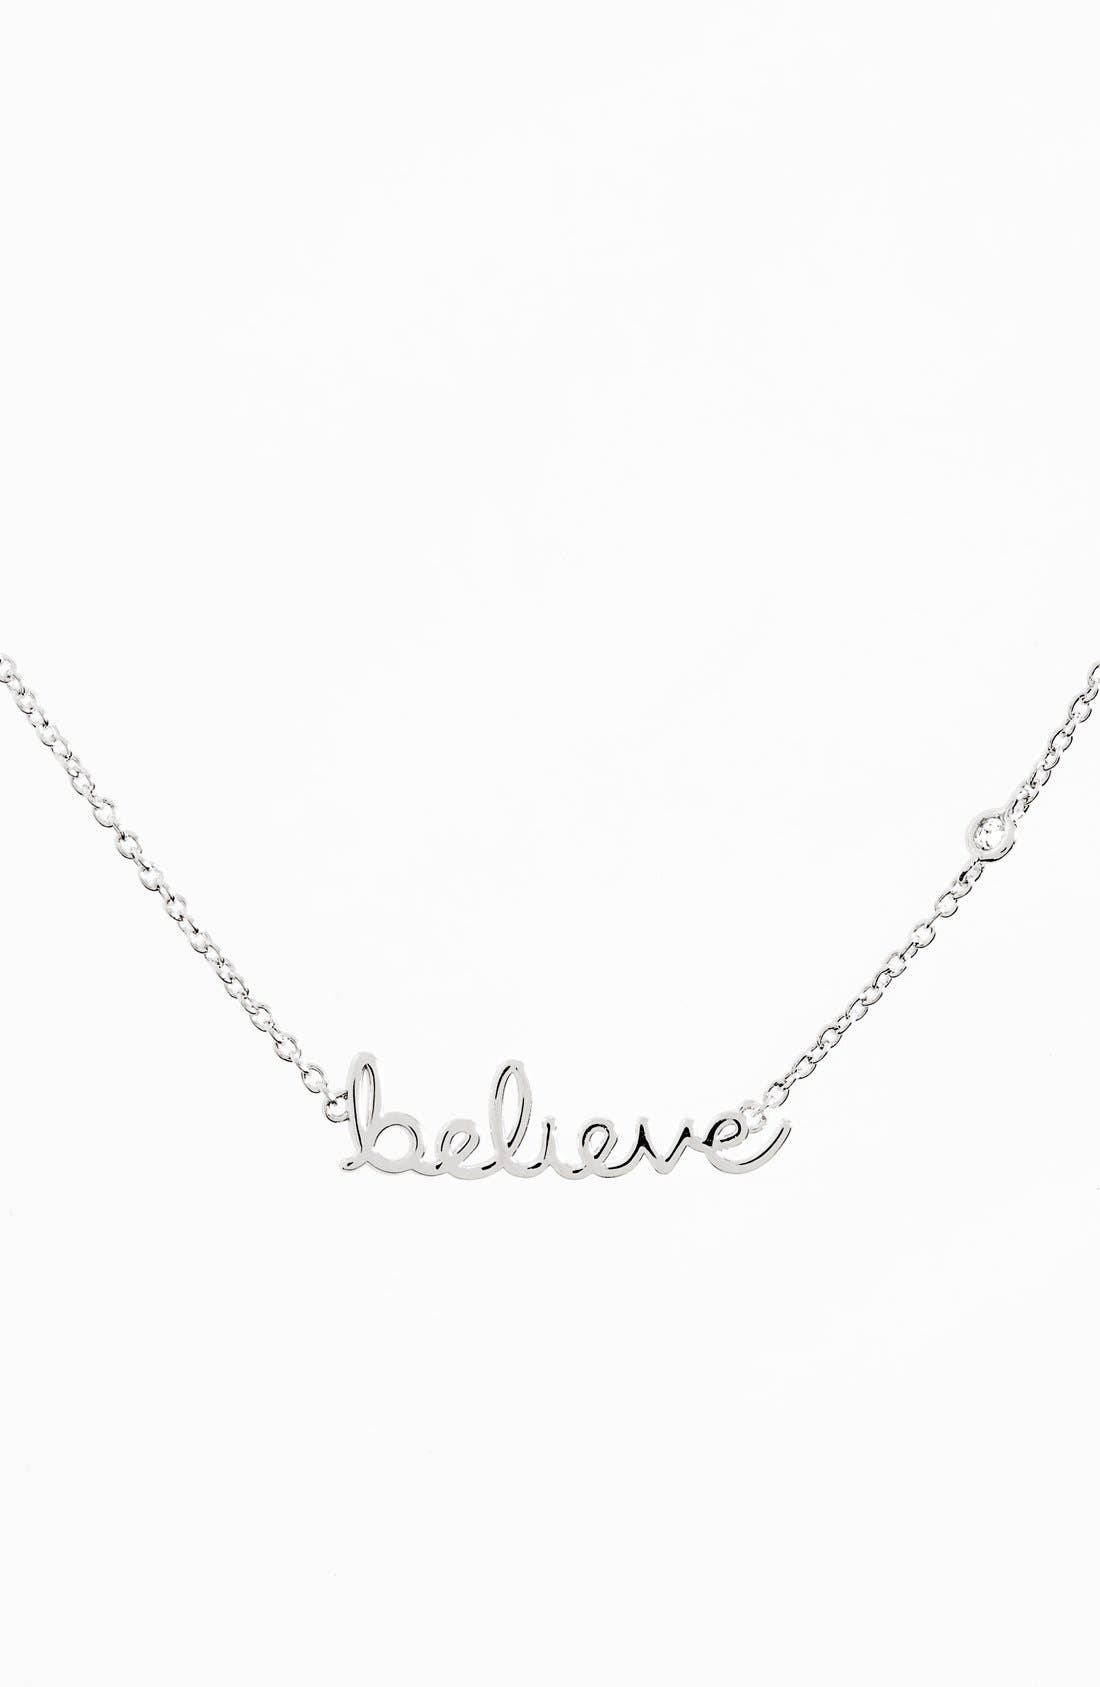 'Believe' Necklace,                             Main thumbnail 1, color,                             Silver